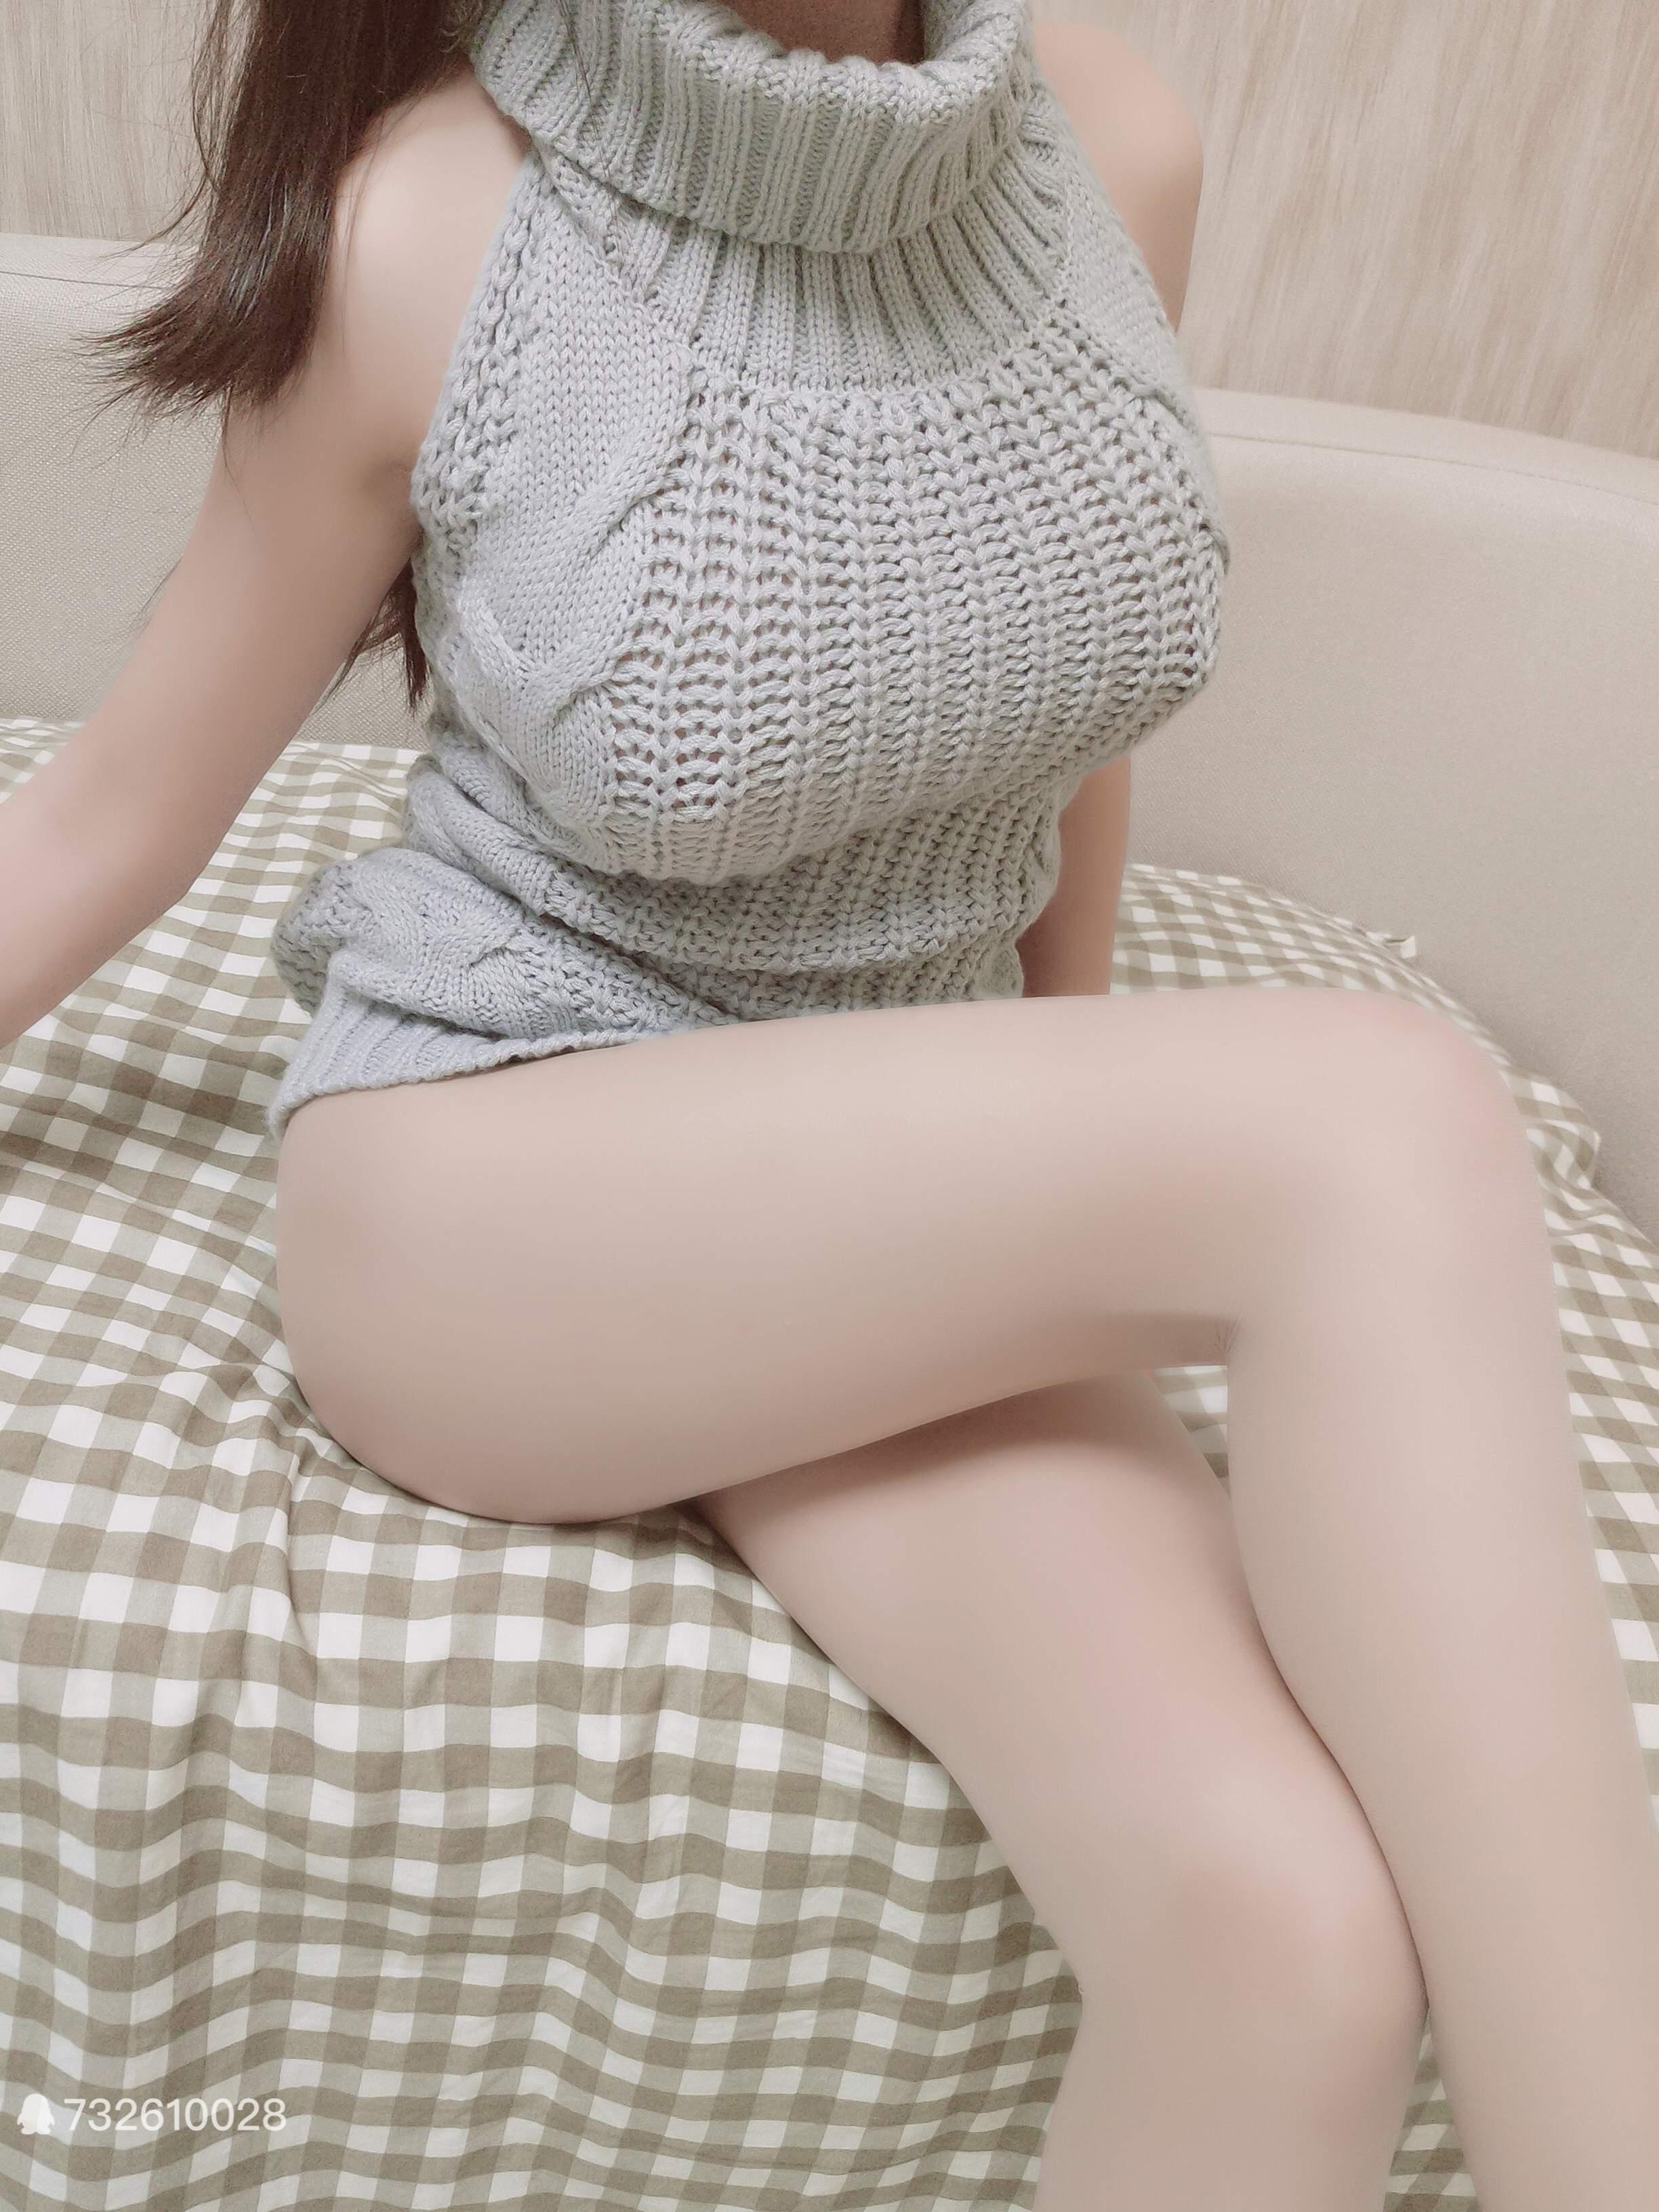 【Cosplay】麻酥酥哟-露背毛衣 39P+3V